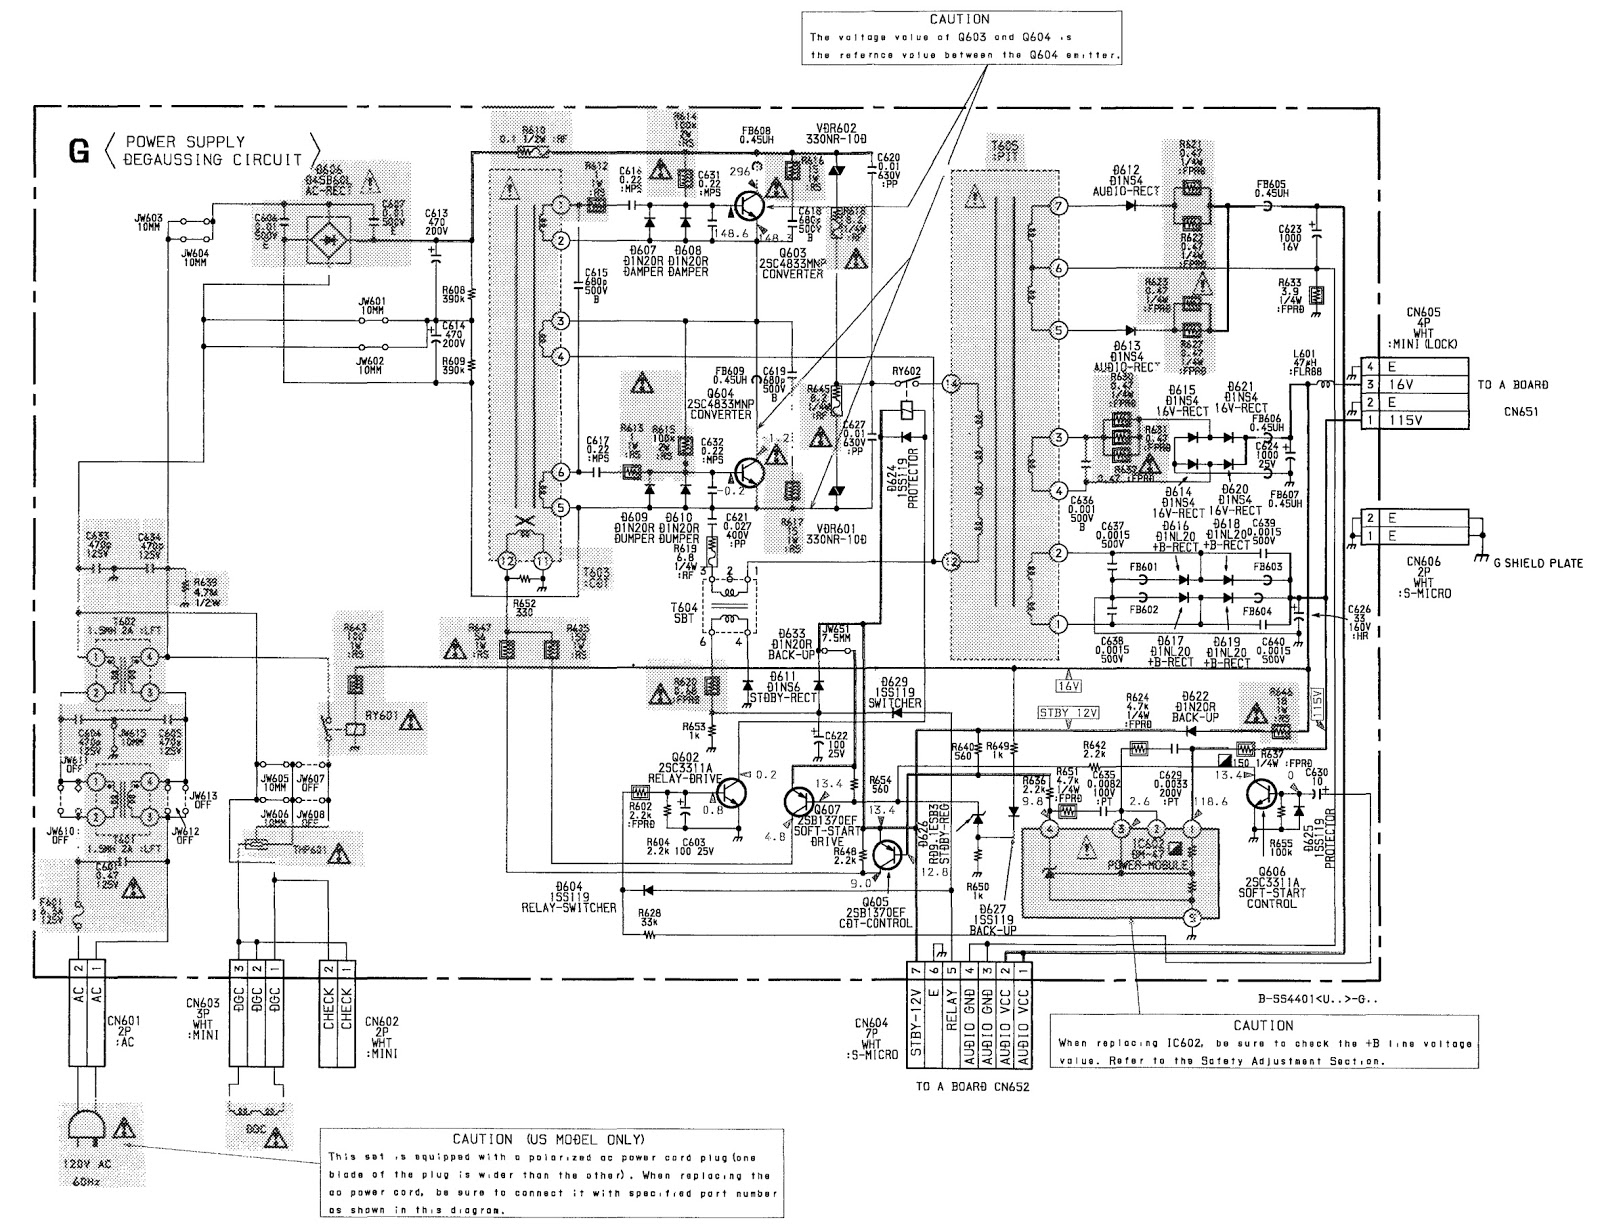 [DIAGRAM] Sony Bravia Schematic Diagram FULL Version HD